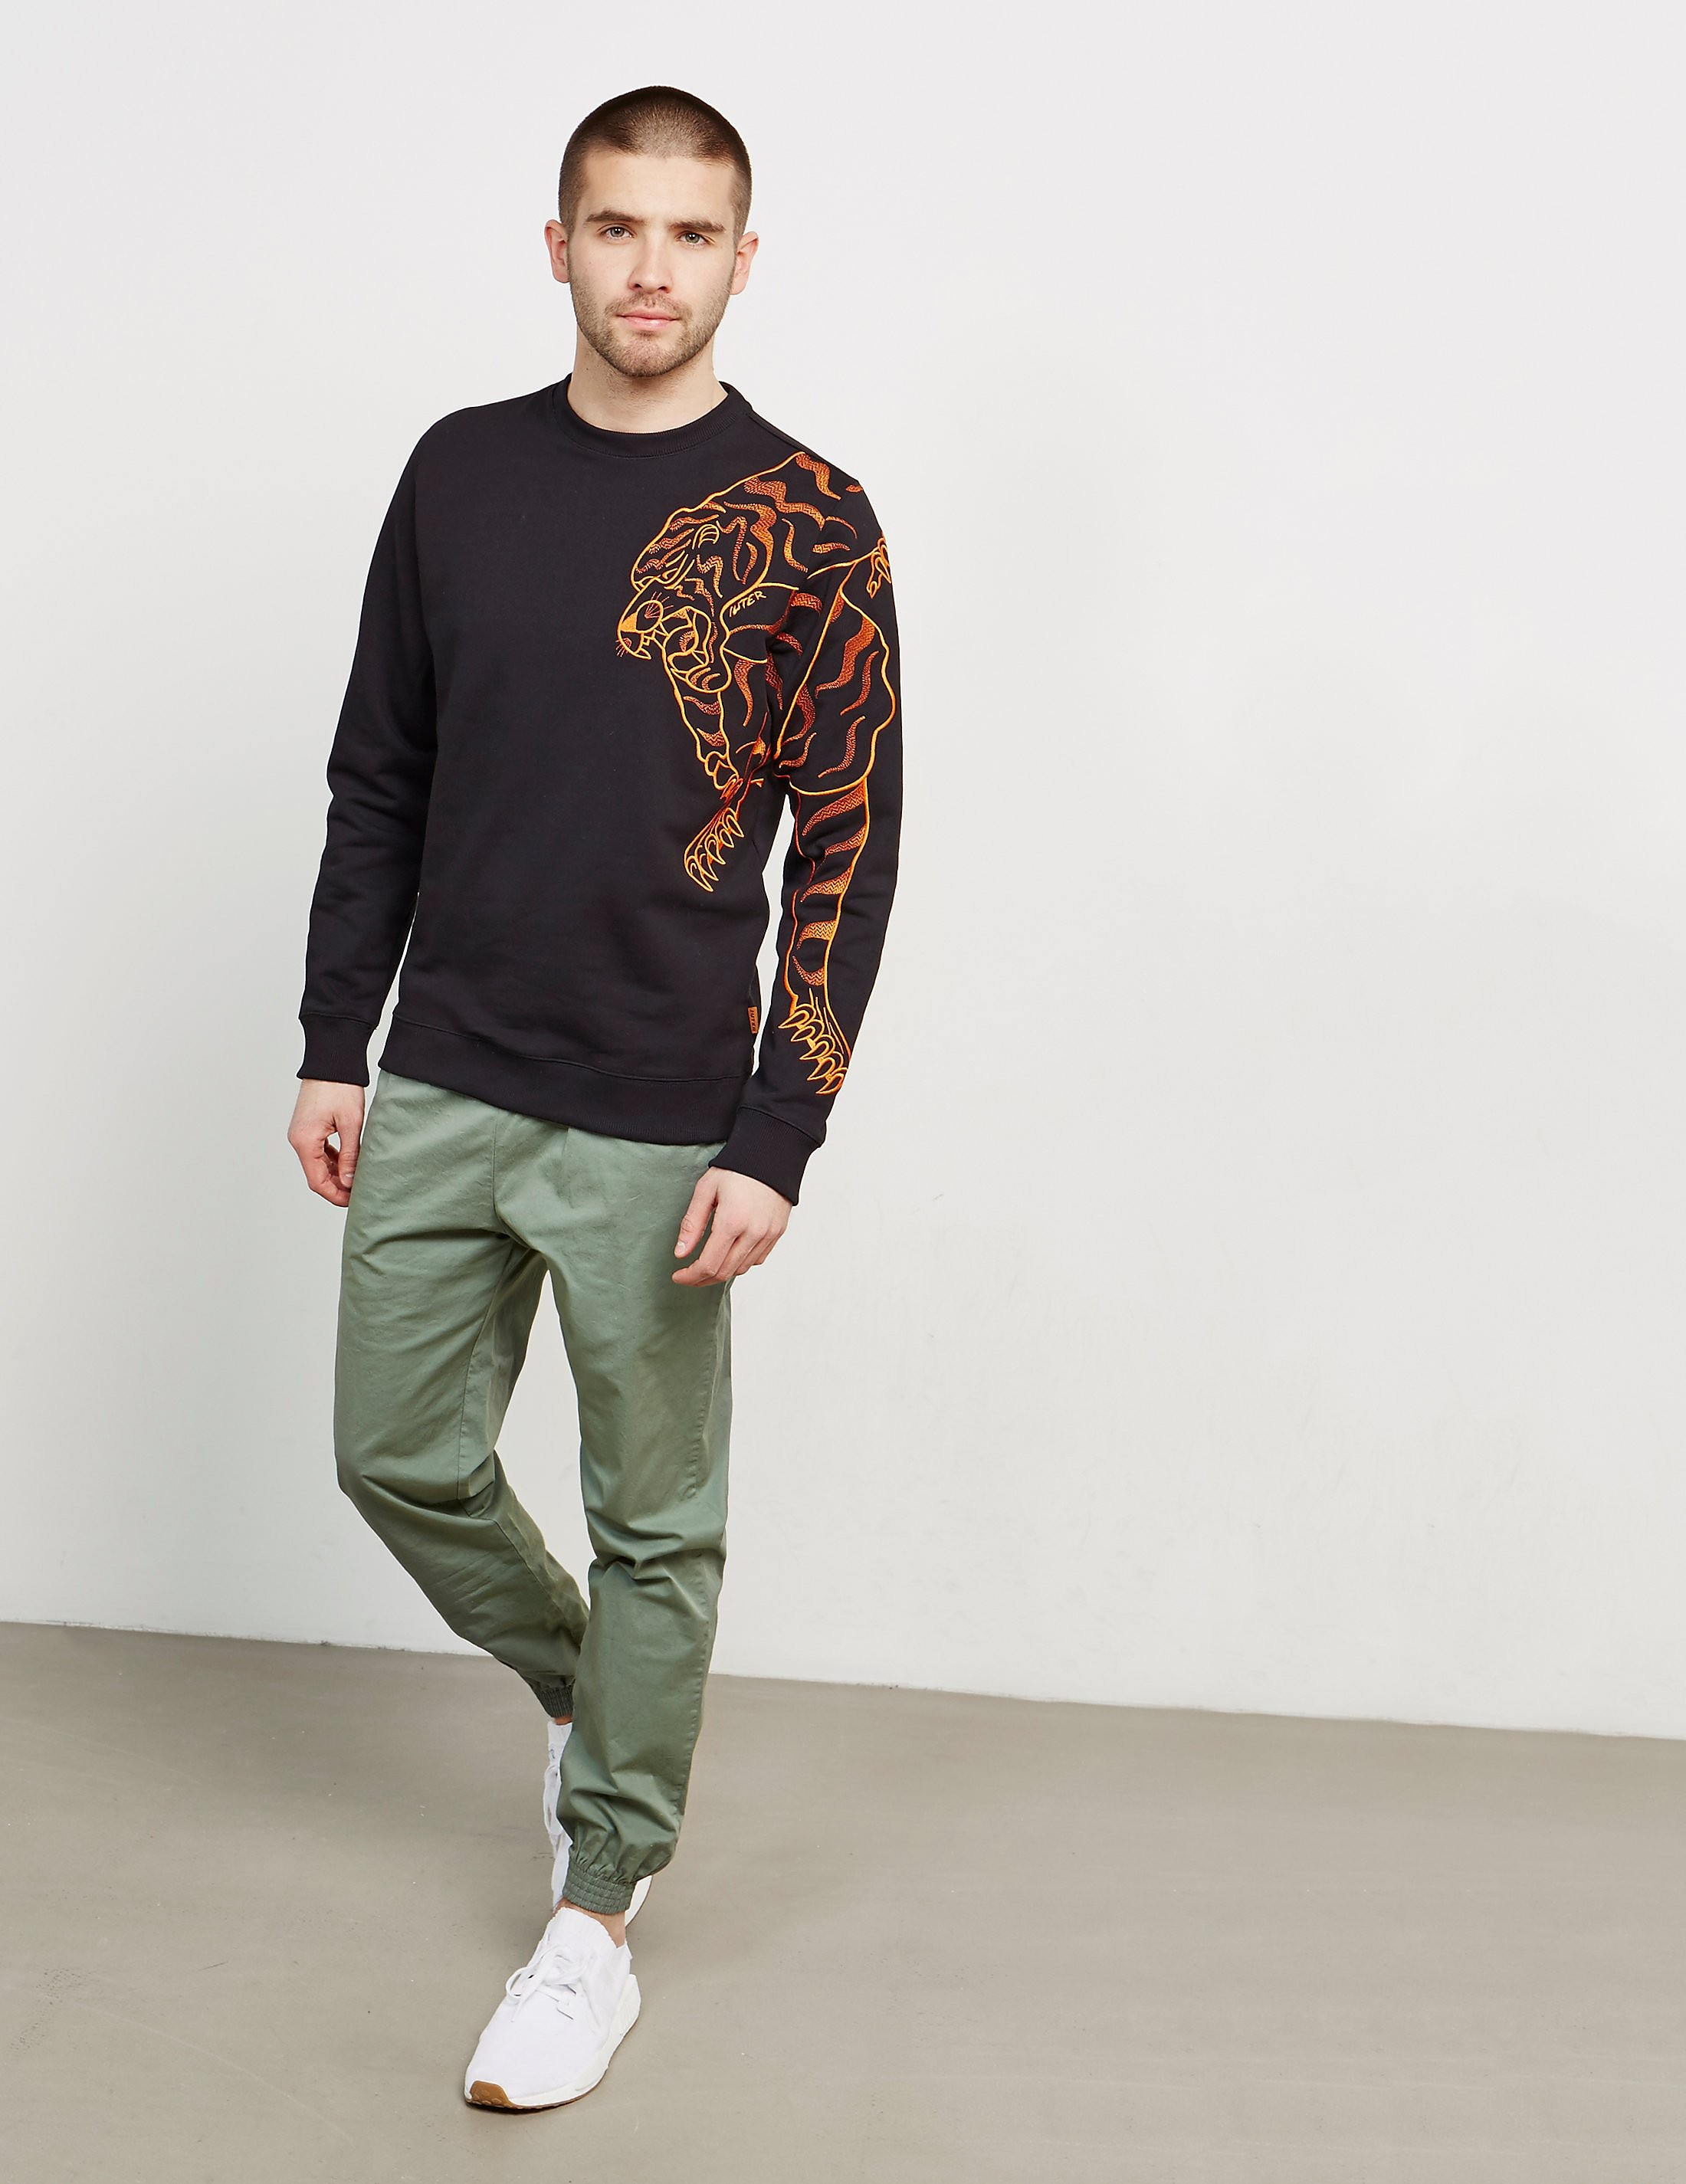 IUTER Nepal Sweatshirt - Exclusive